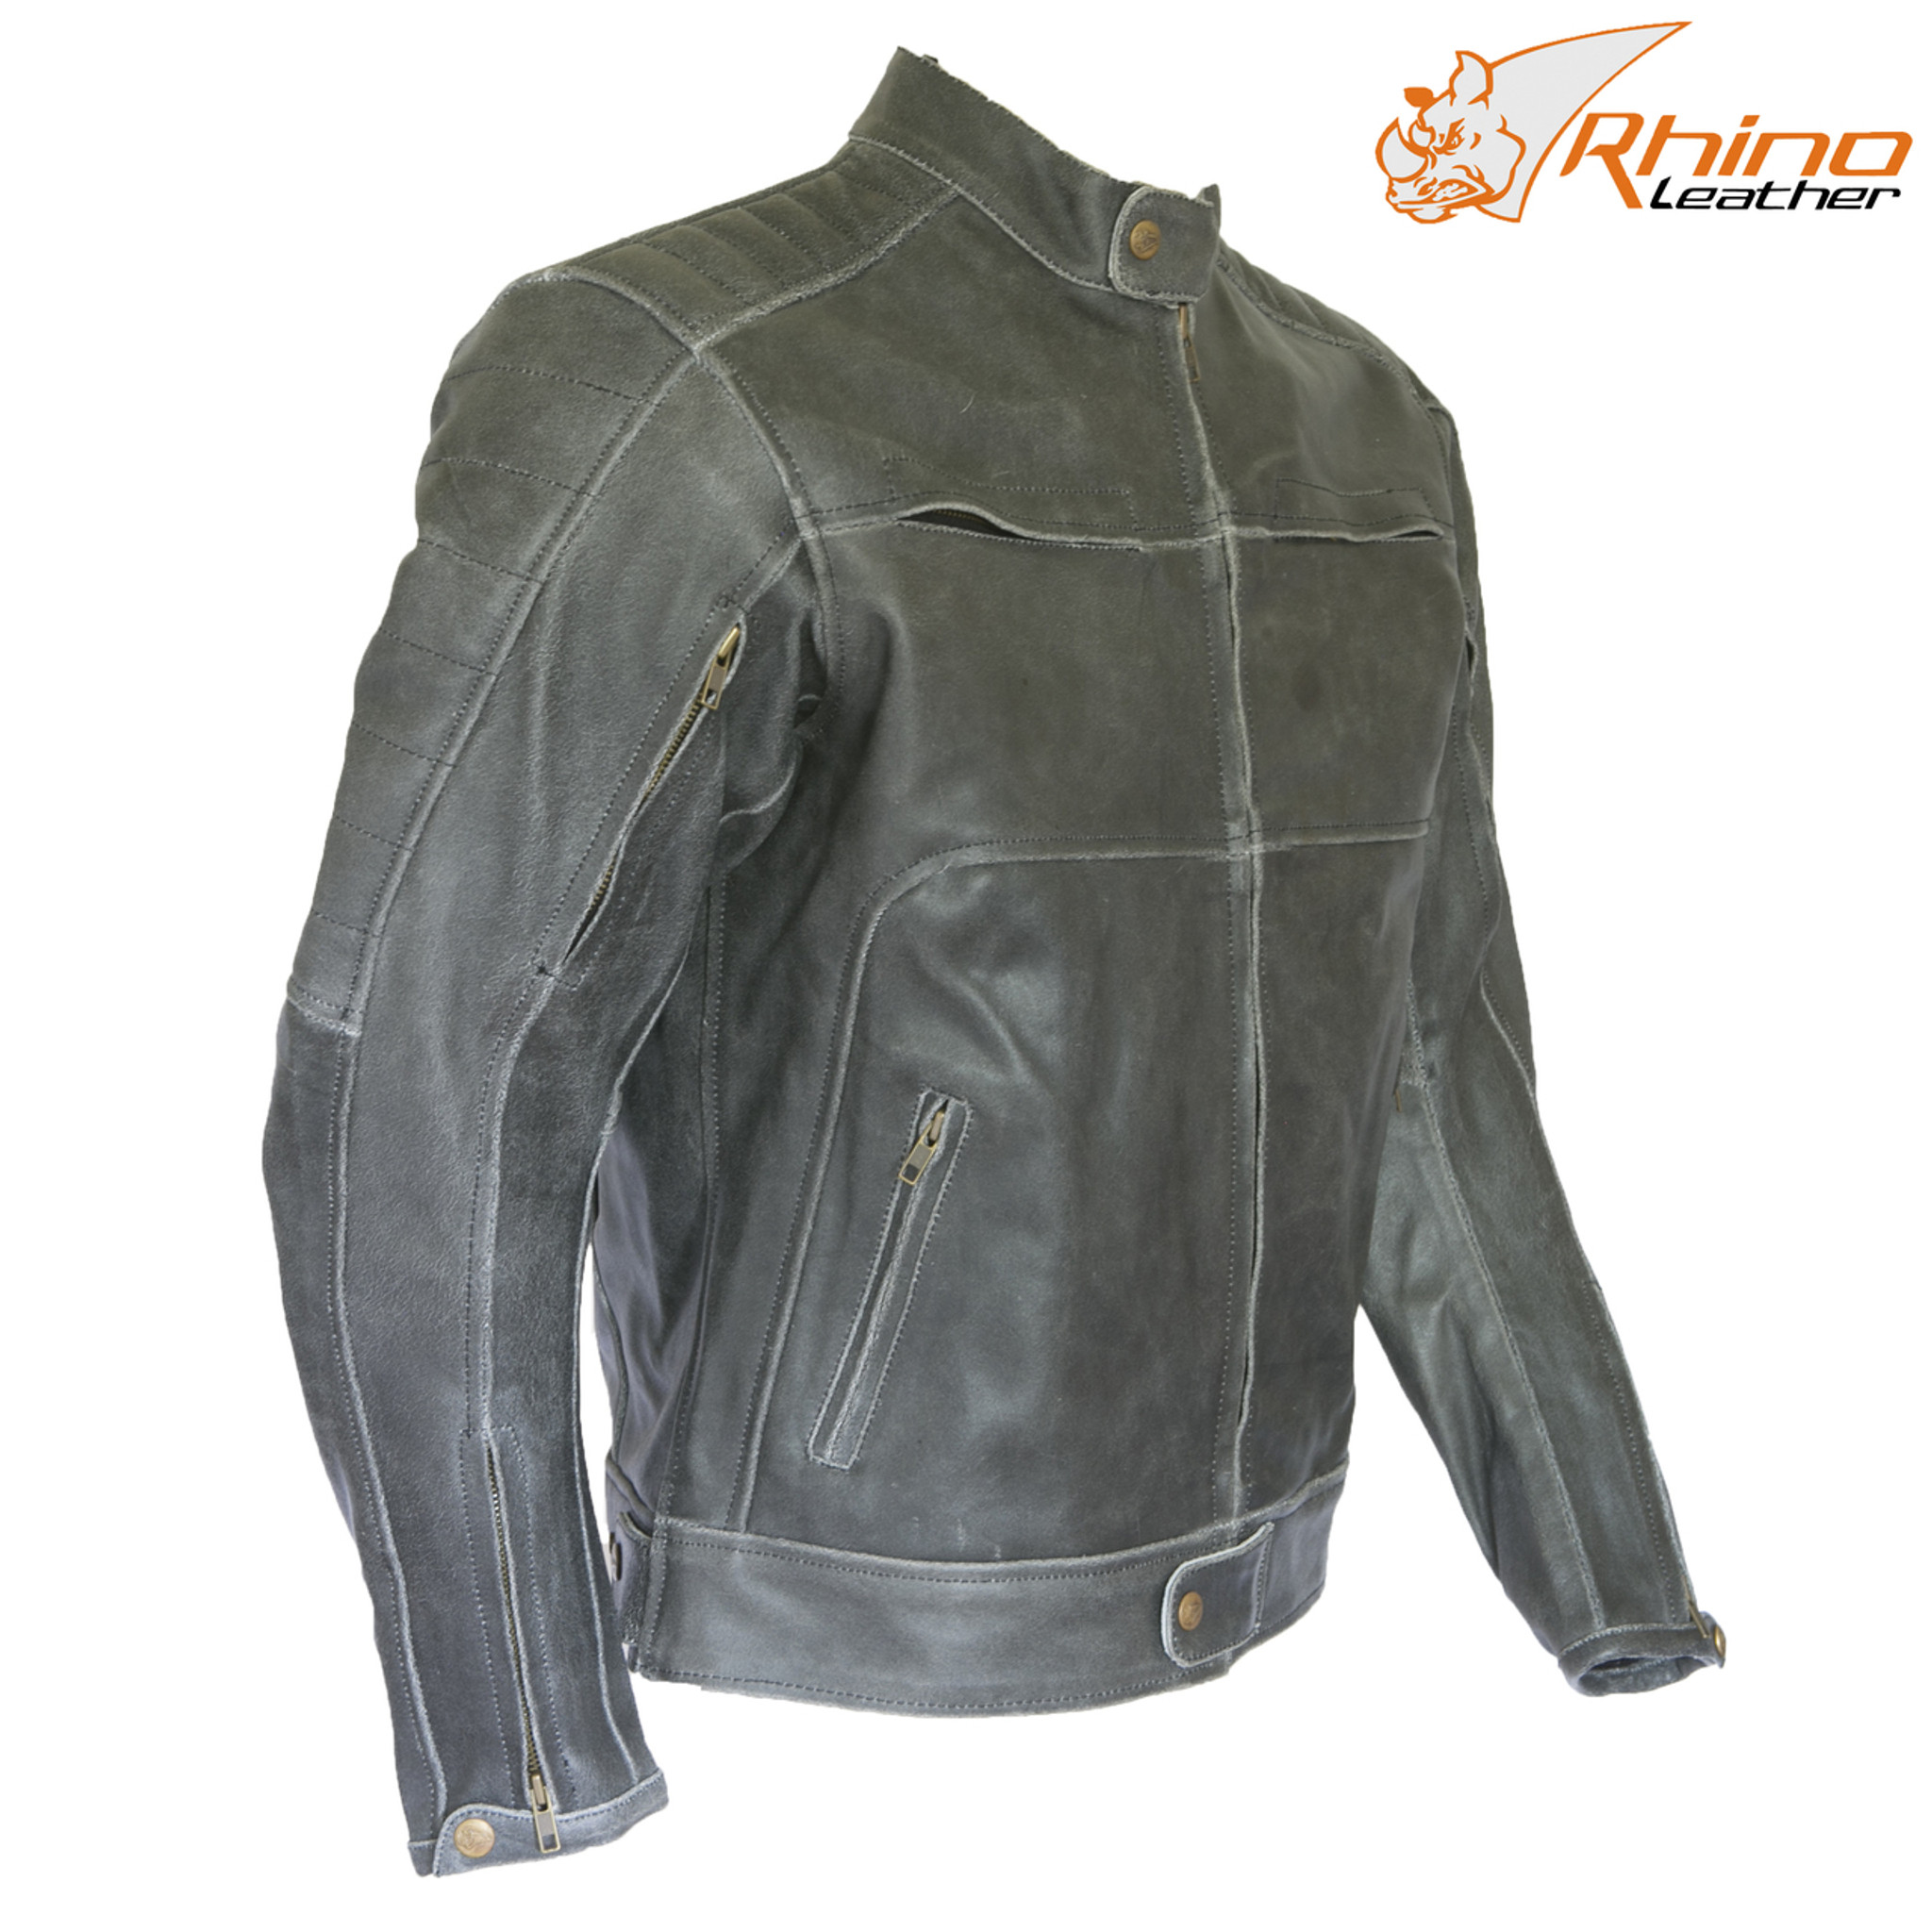 Vintage Leather Jacket >> Black Vintage Leather Motorcycle Jacket For Motorbike Rider